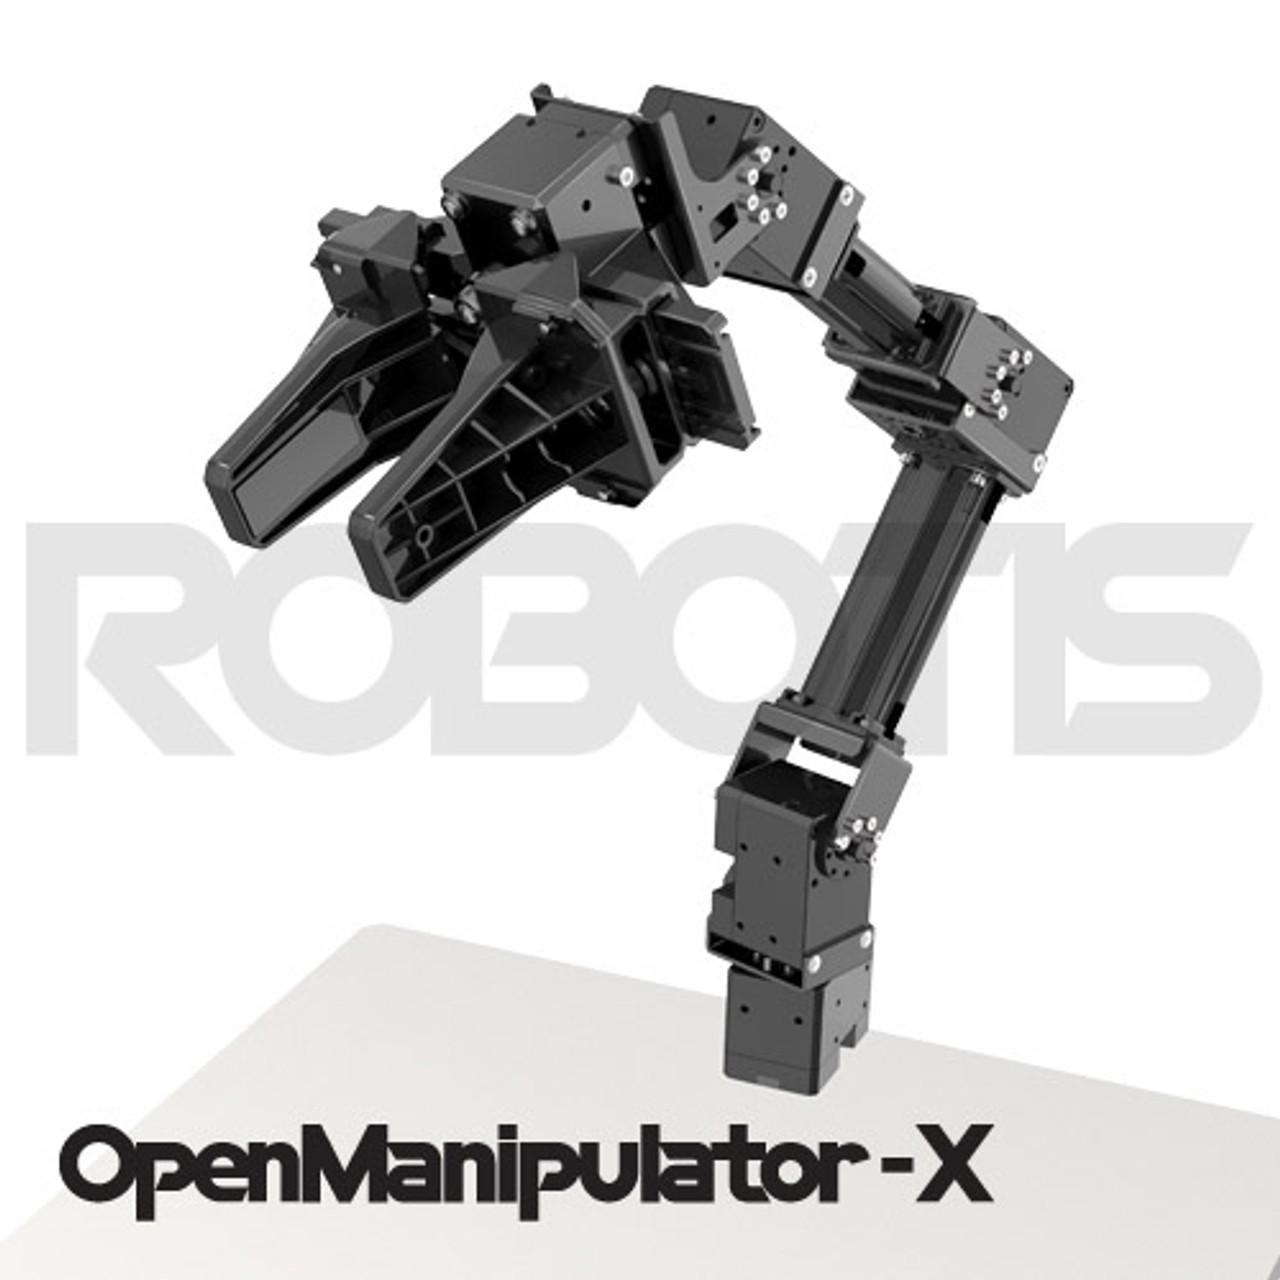 OpenManipulator-X (RM-X52-TNM)